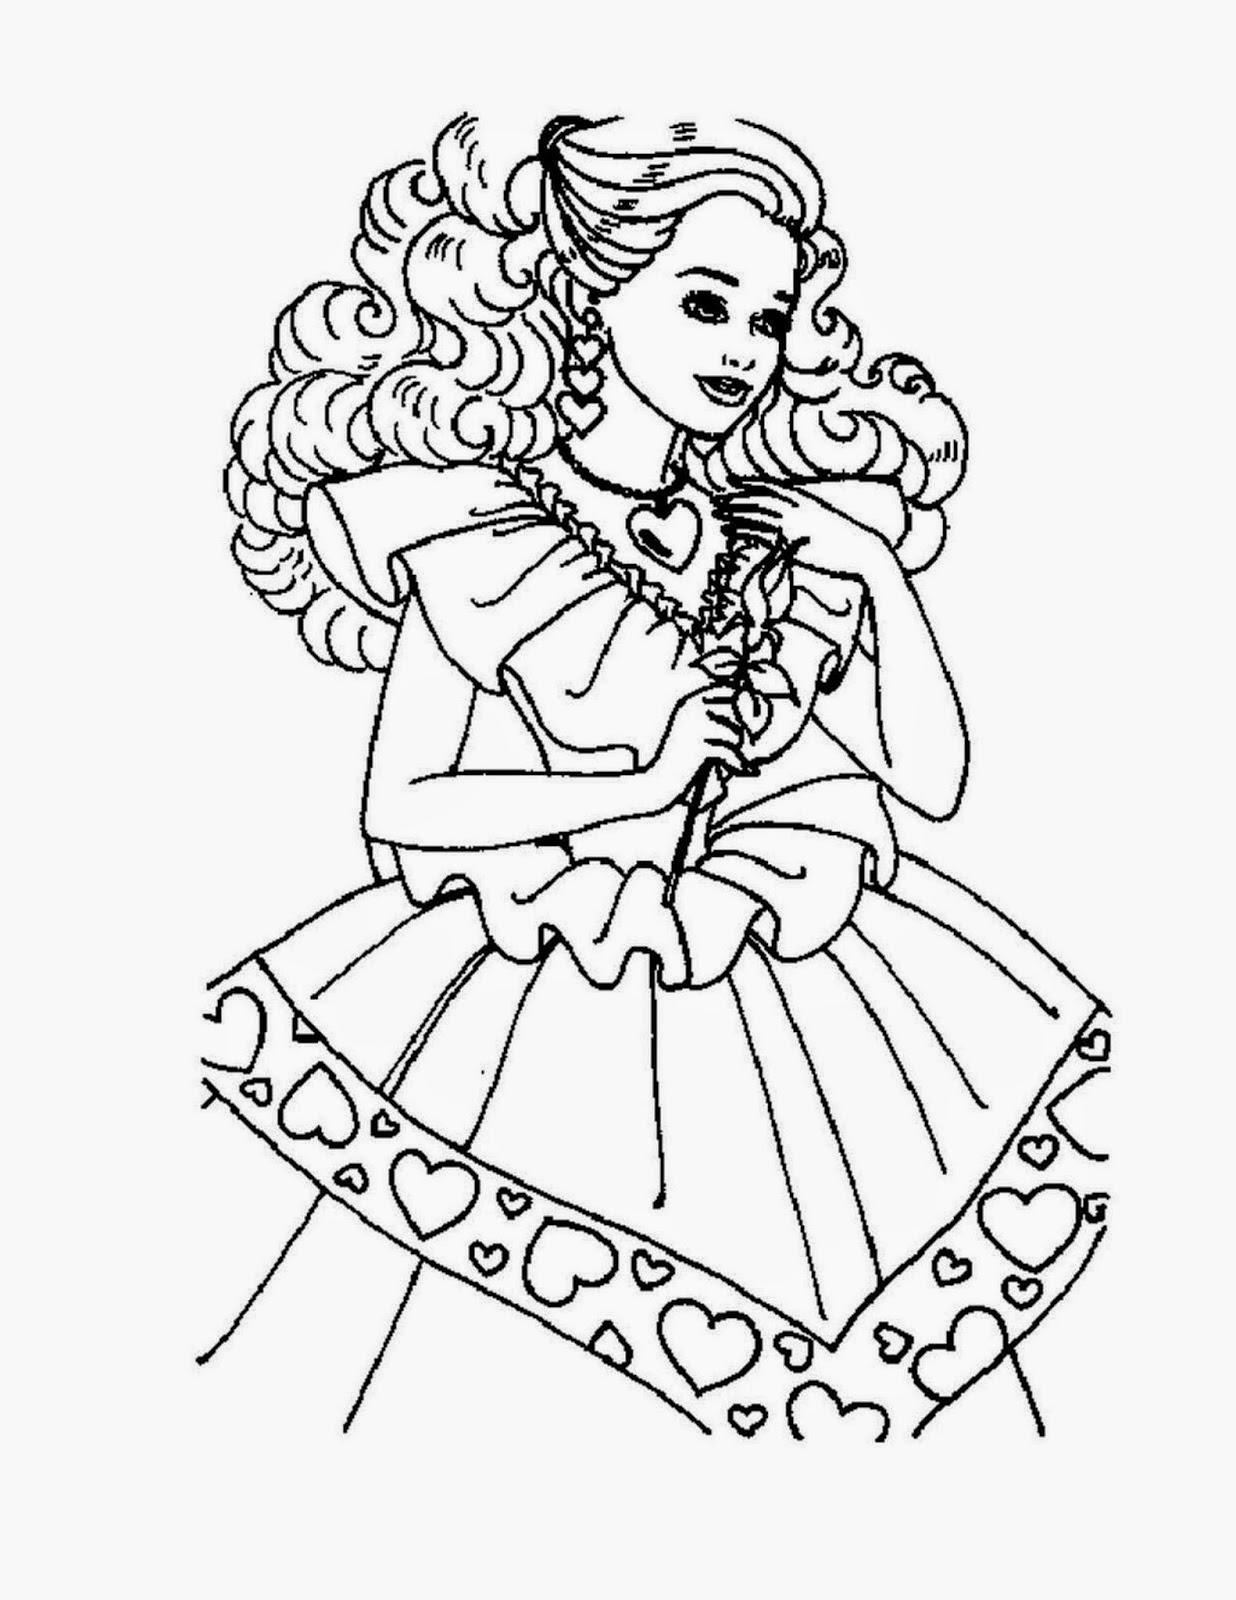 Gambar 10 Gambar Mewarnai Barbie Mariposa Kartun Lucu Mencari